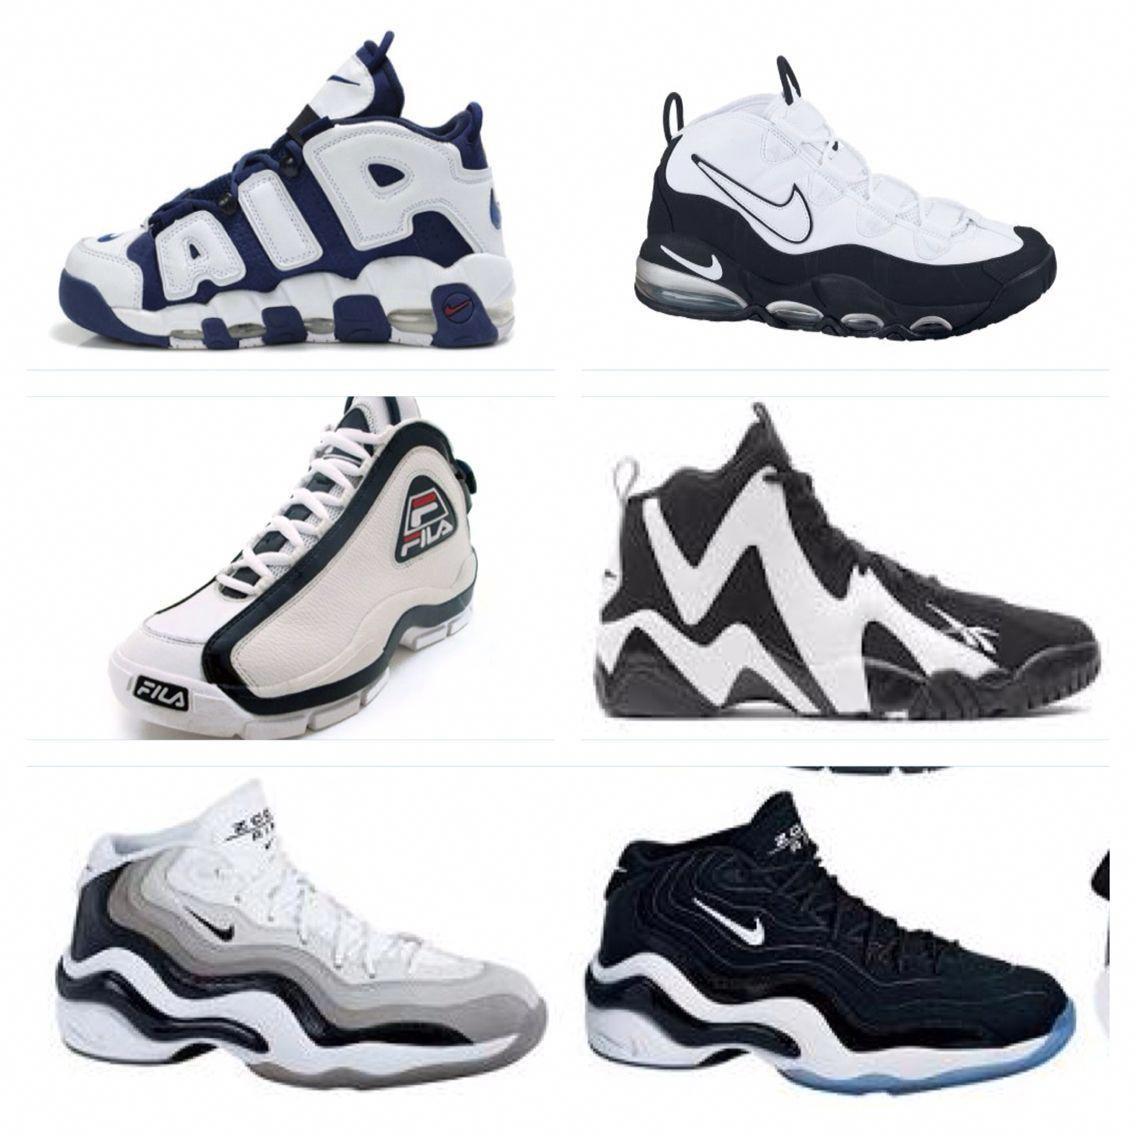 Basketball shoes bestbasketballshoes Zapatillas hombre